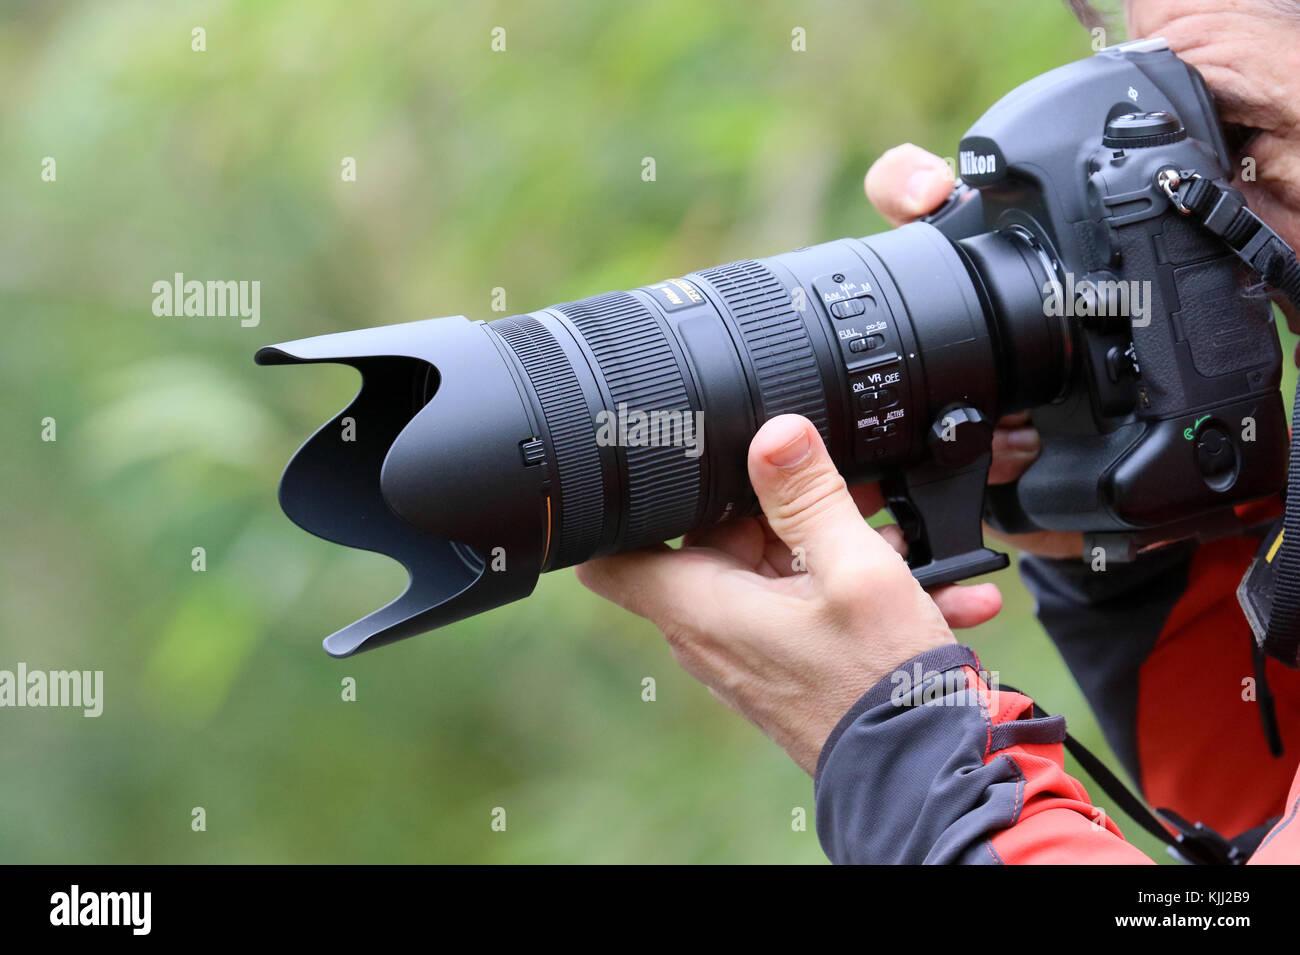 Photographer using a digital camera.  France. - Stock Image